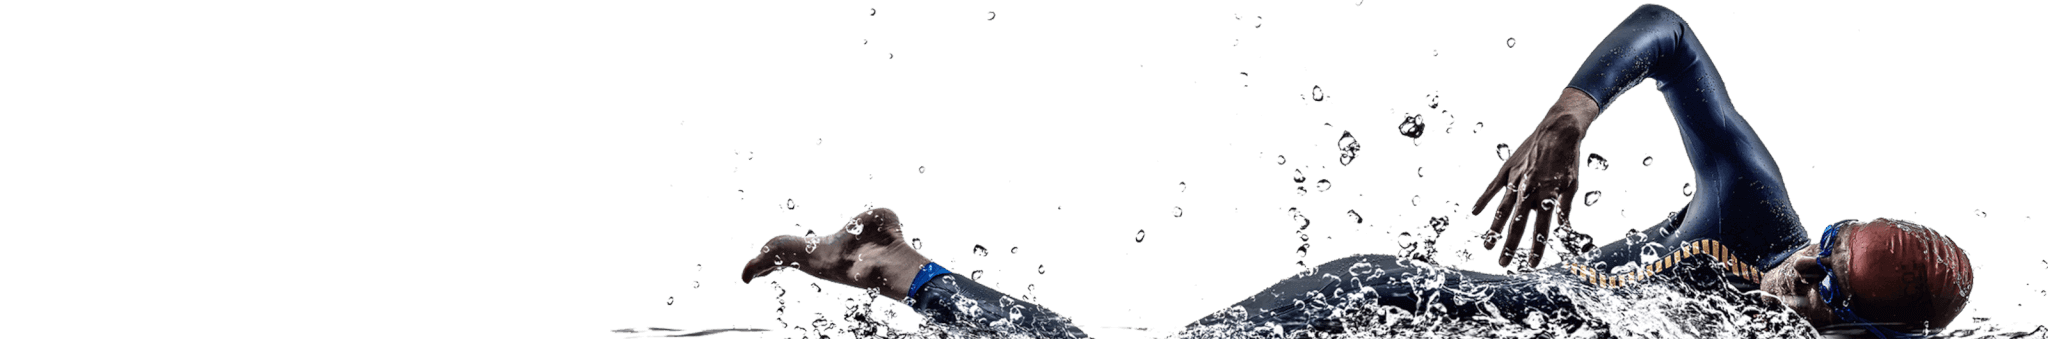 https://dlpp.ru/wp-content/uploads/2019/11/inner_swimmer-1.png